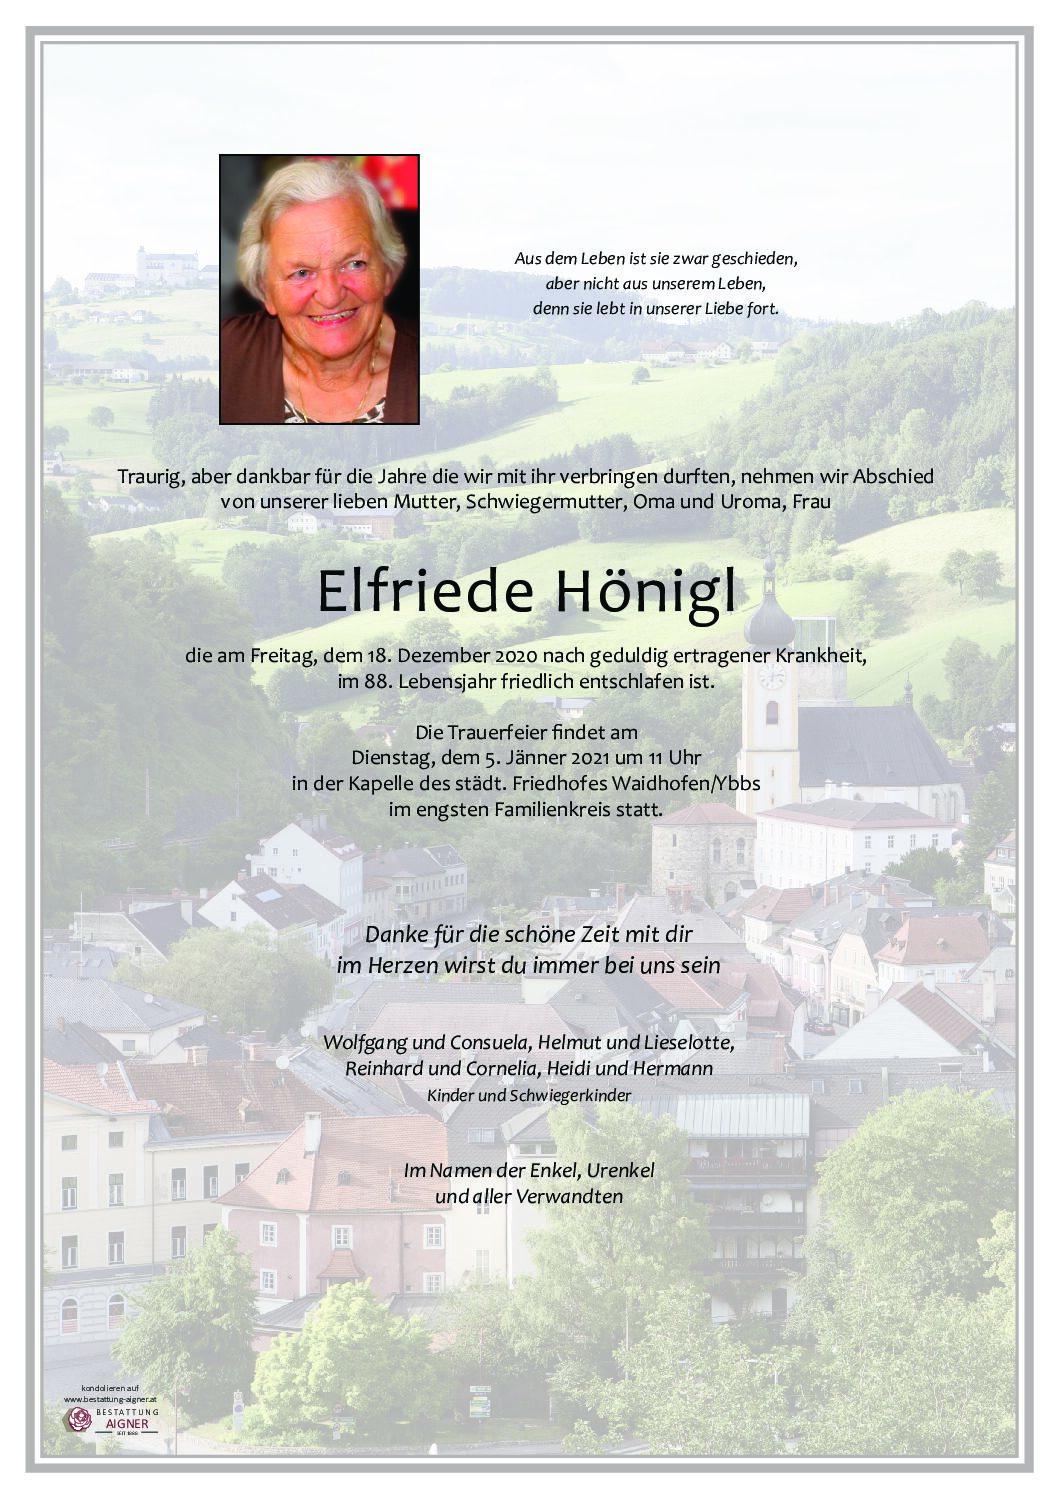 Elfriede Hönigl